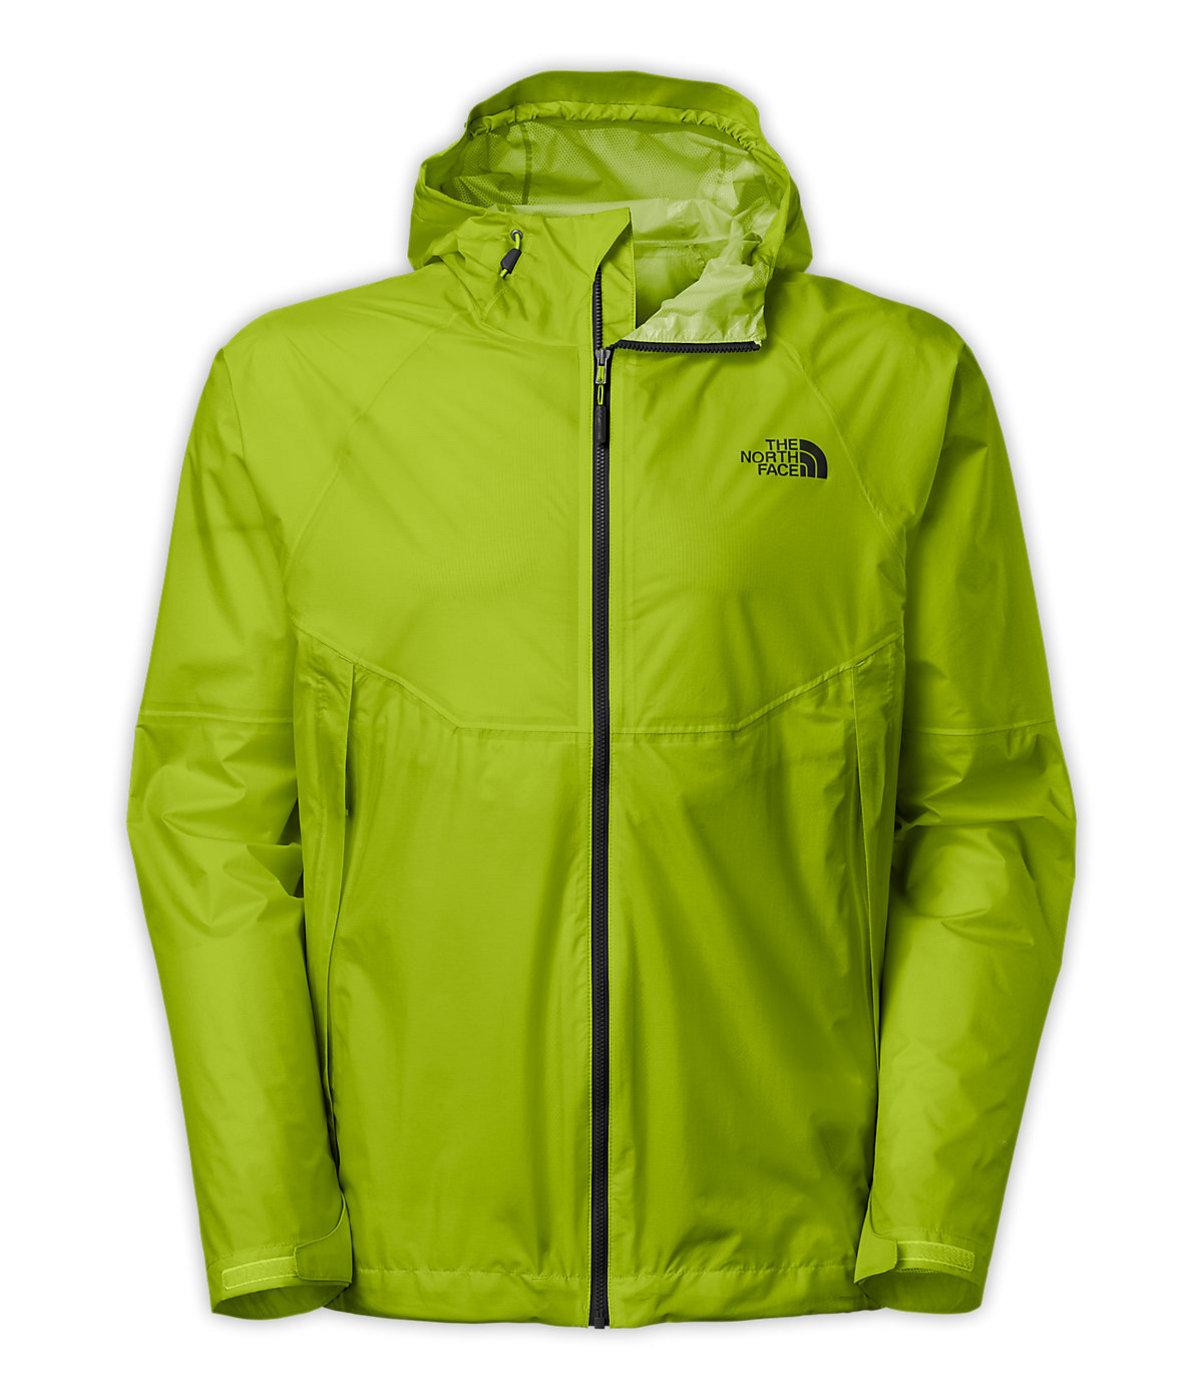 e6c53d6953 The North Face Men s Venture Fastpack Jacket